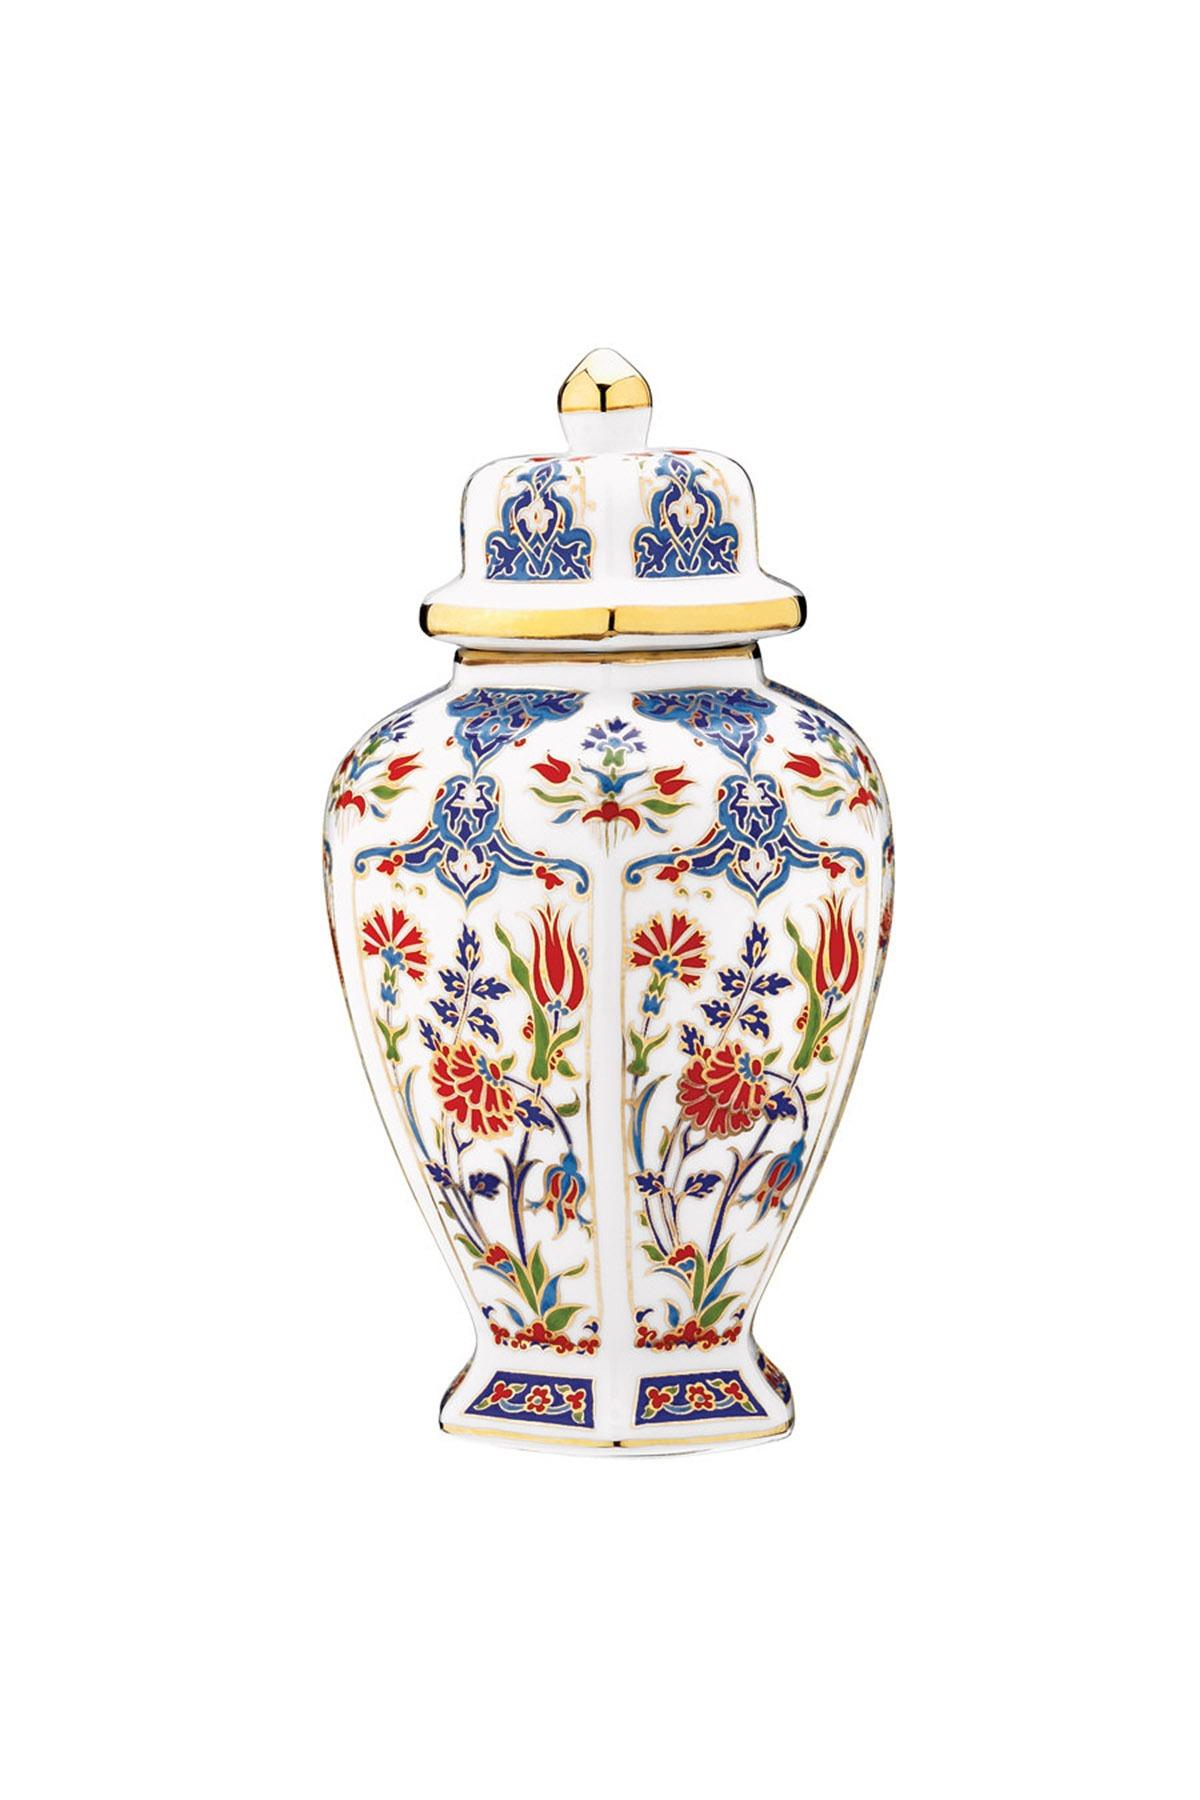 Kütahya Porselen - Kütahya Porselen El Yapımı Kapaklı Küp No 6